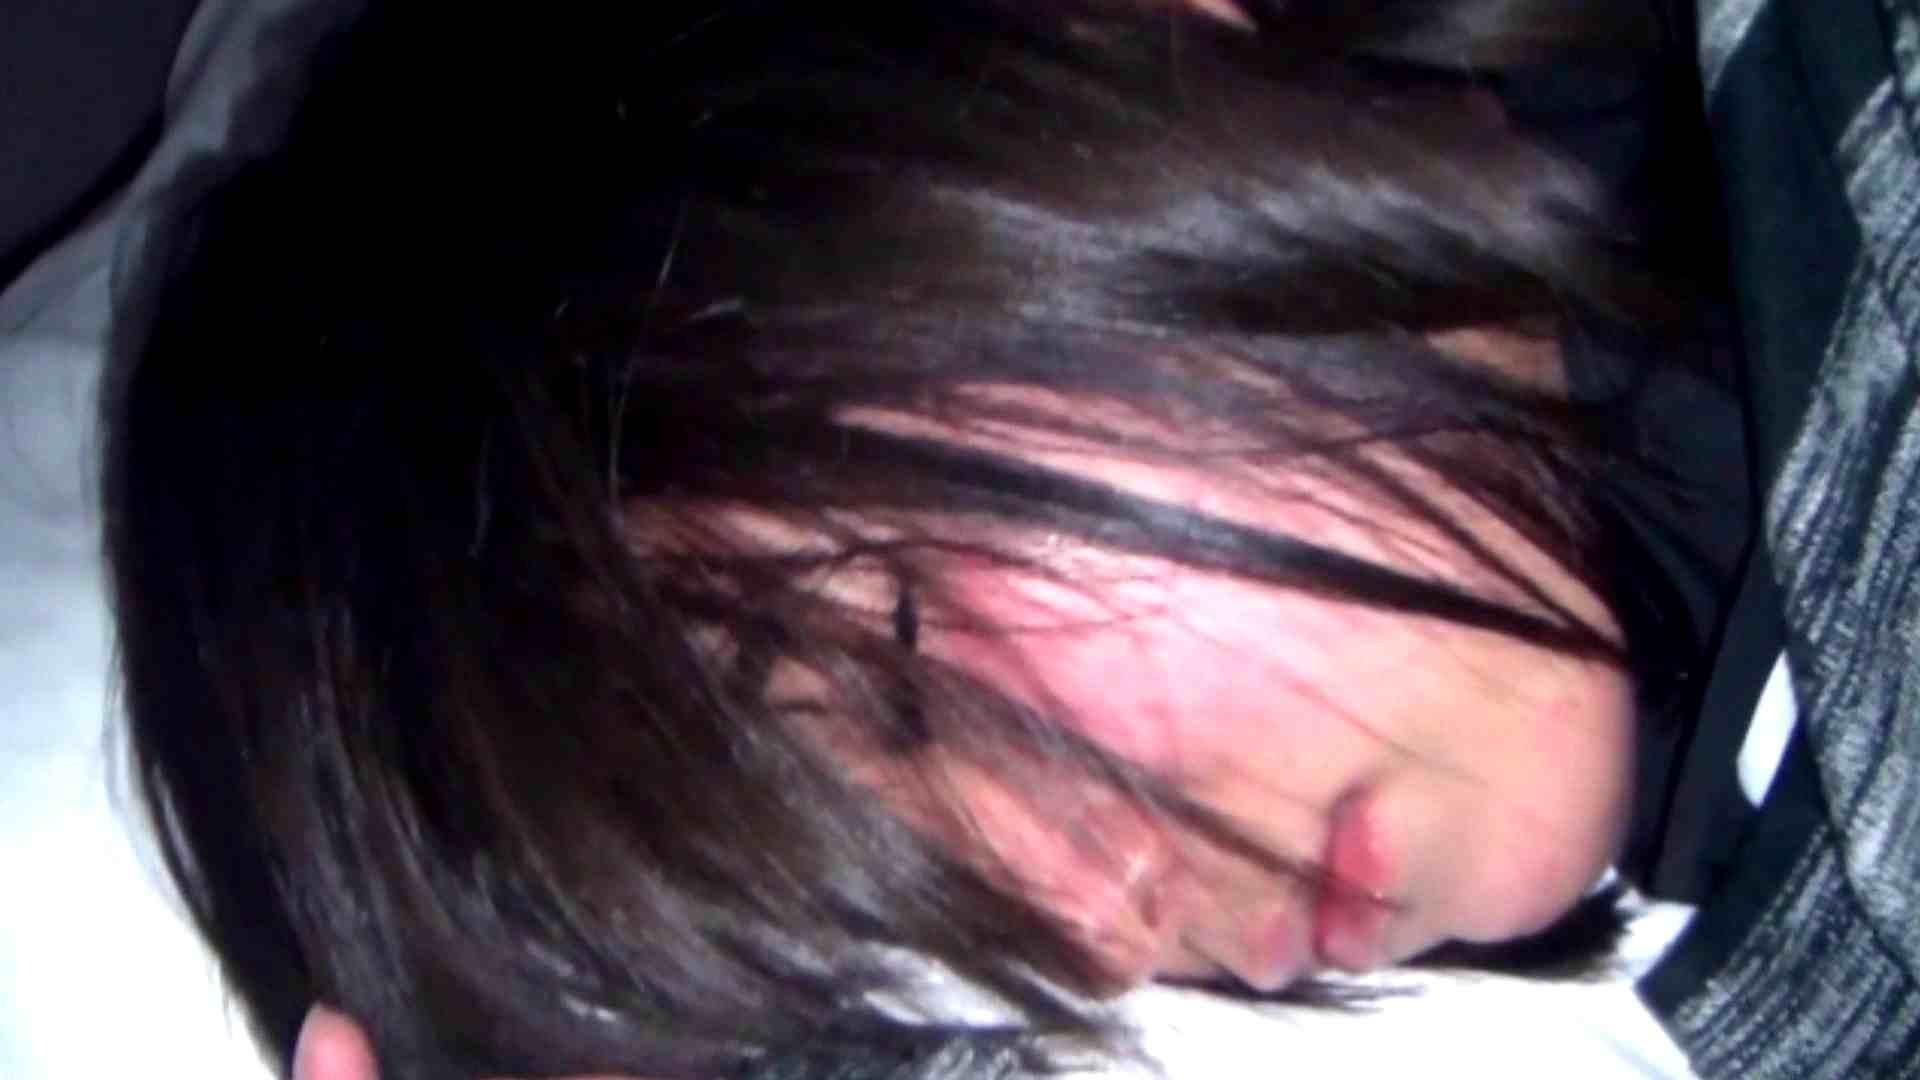 vol.34 【AIちゃん】 黒髪19歳 夏休みのプチ家出中 1回目 ギャル攻め AV無料 68画像 17